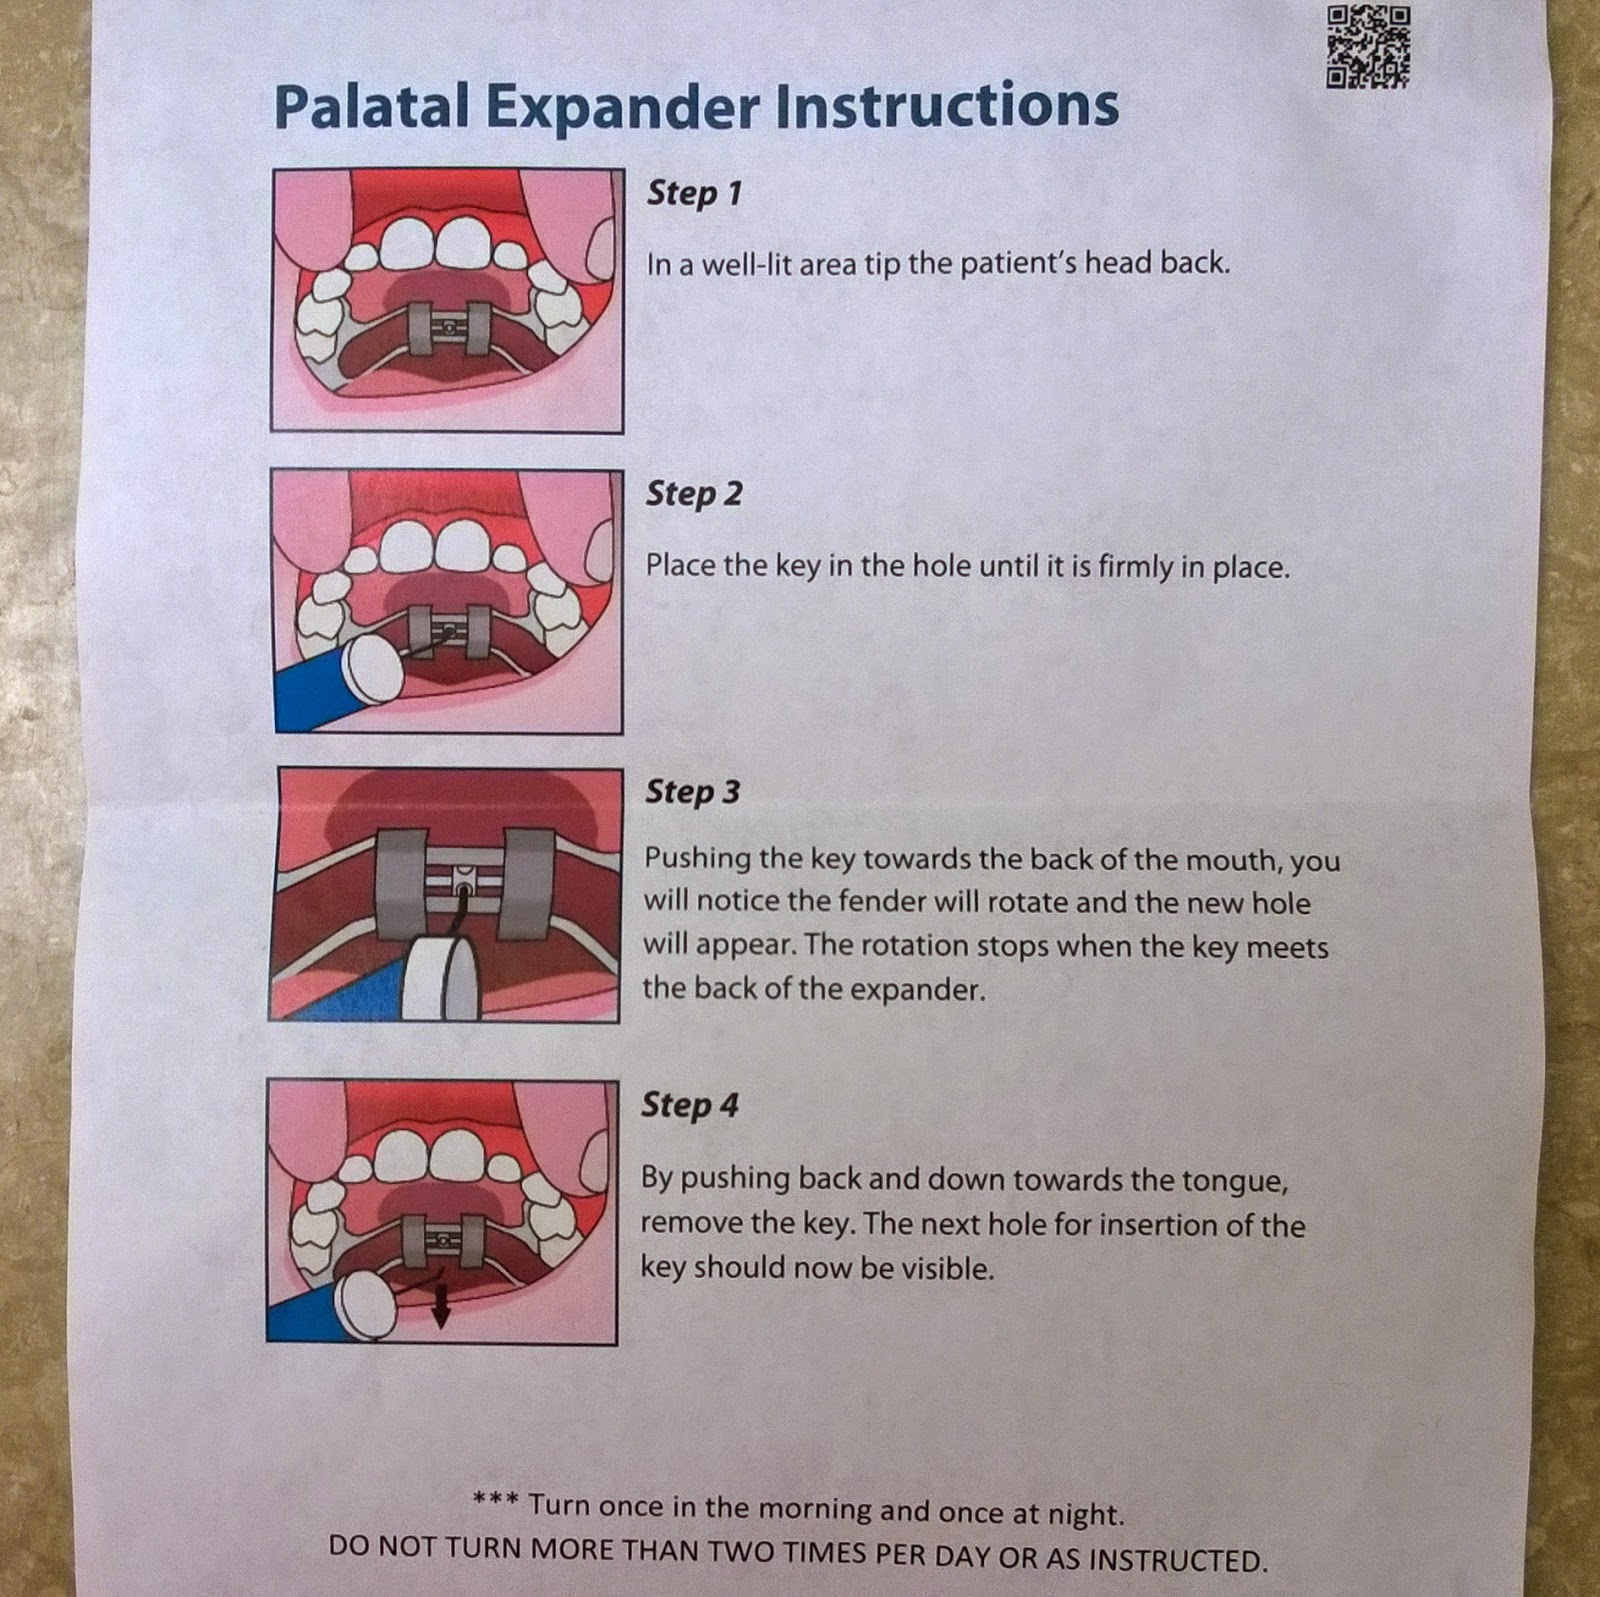 palatal expandor instructions